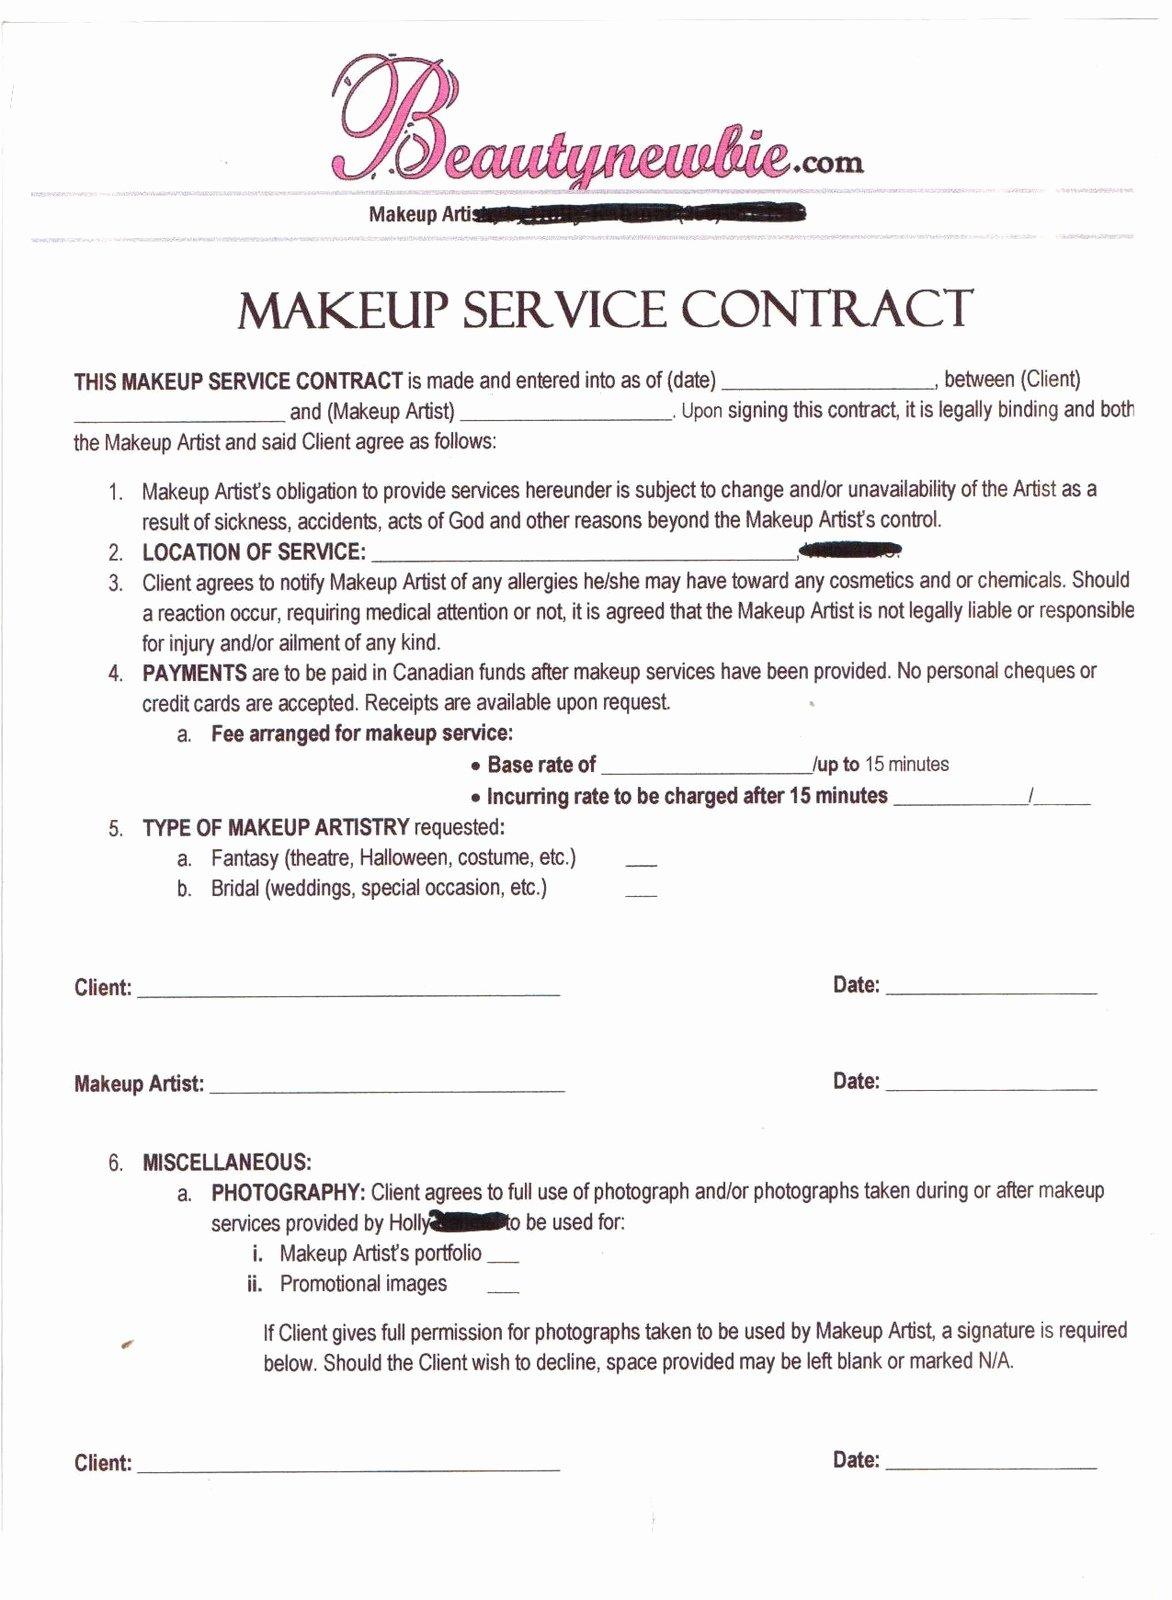 Freelance Makeup Artist Contract Template Inspirational Freelance Makeup Artist Contract Template